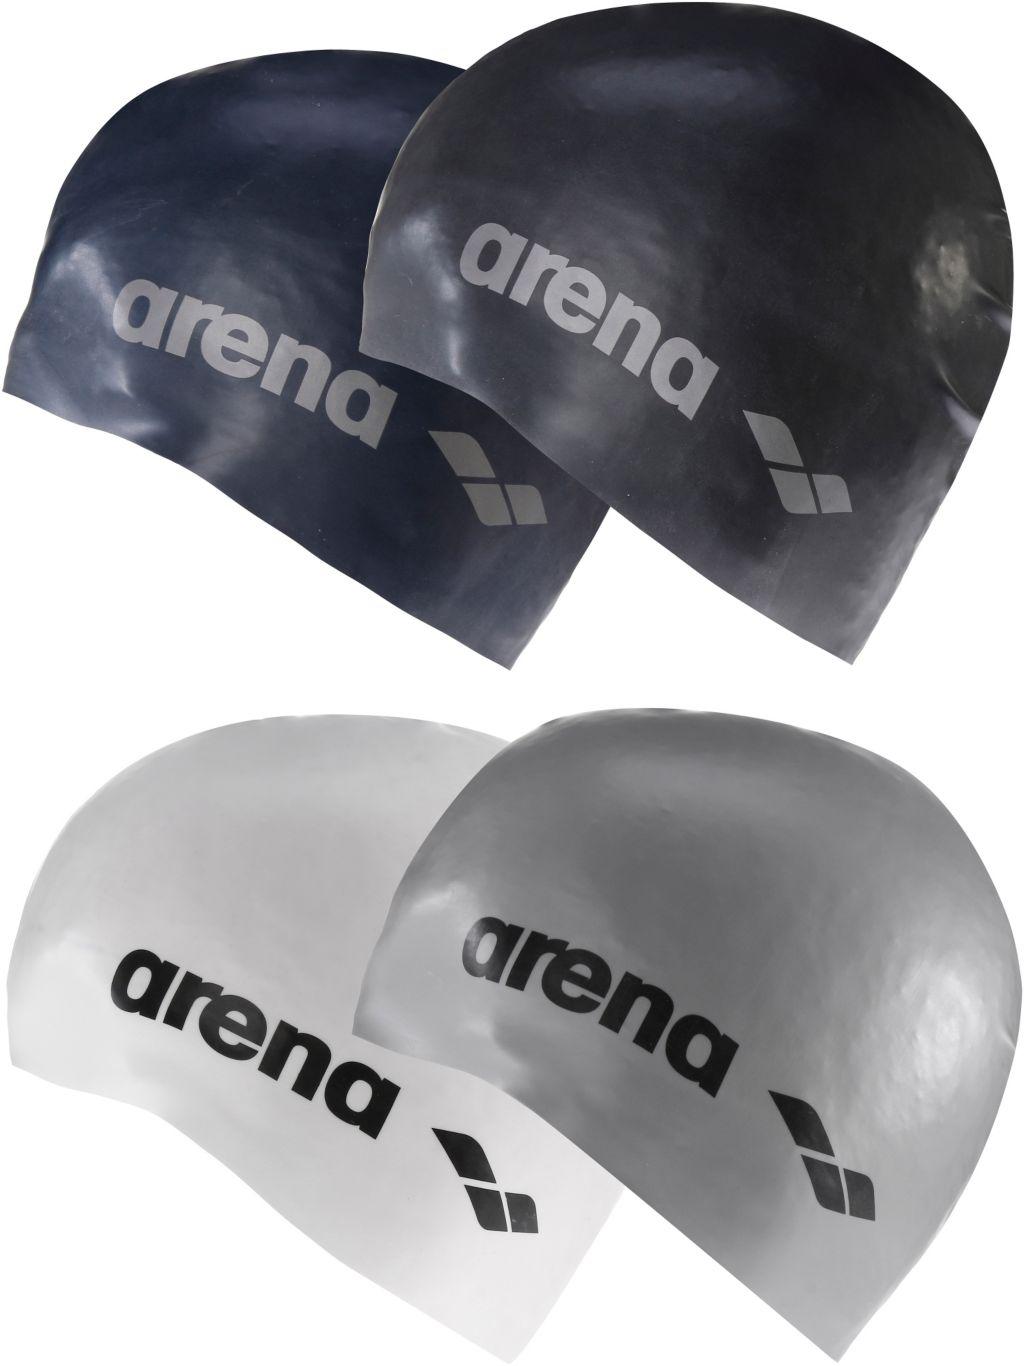 Bild Arena Classic Badekappe